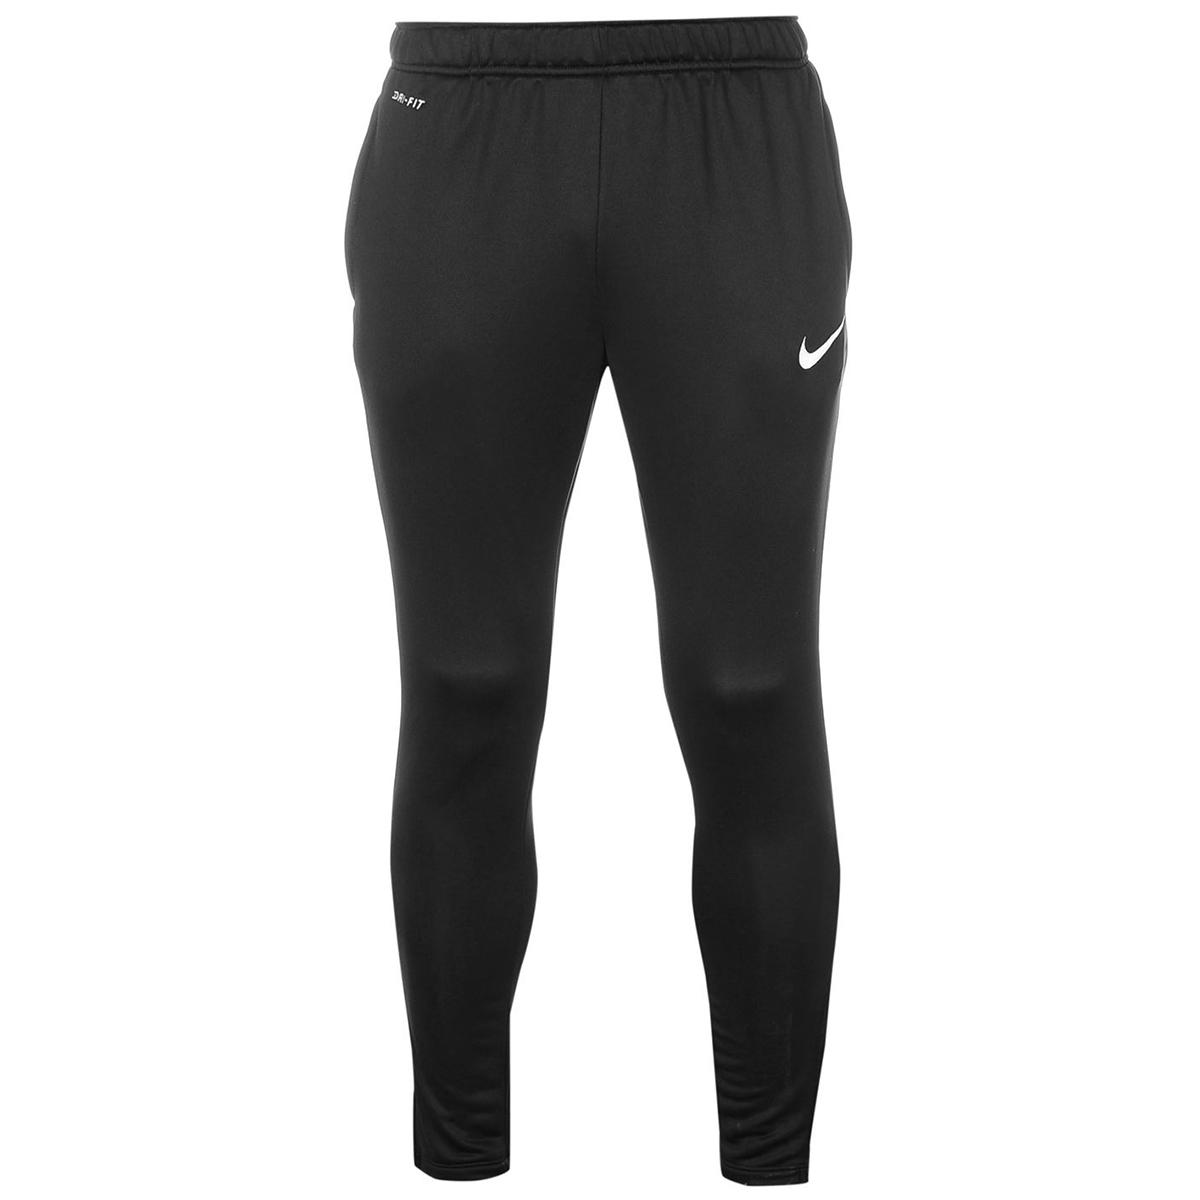 Nike Men's Dry Fit Academy Pants - Black, XXL